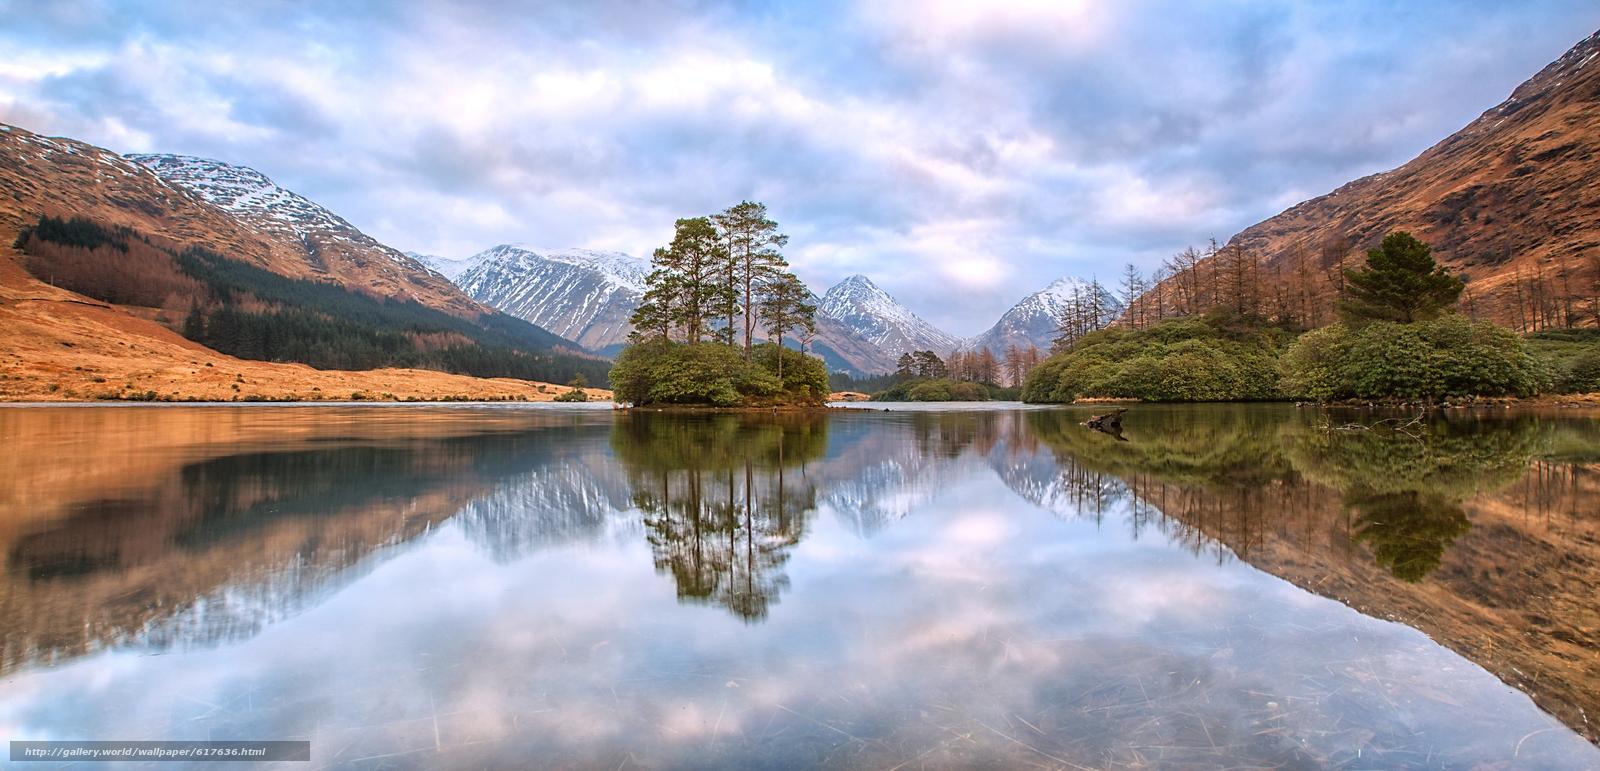 Download wallpaper Lochan Urr,  Scottish Highlands,  Glen Etive,  Scotland free desktop wallpaper in the resolution 6915x3331 — picture №617636